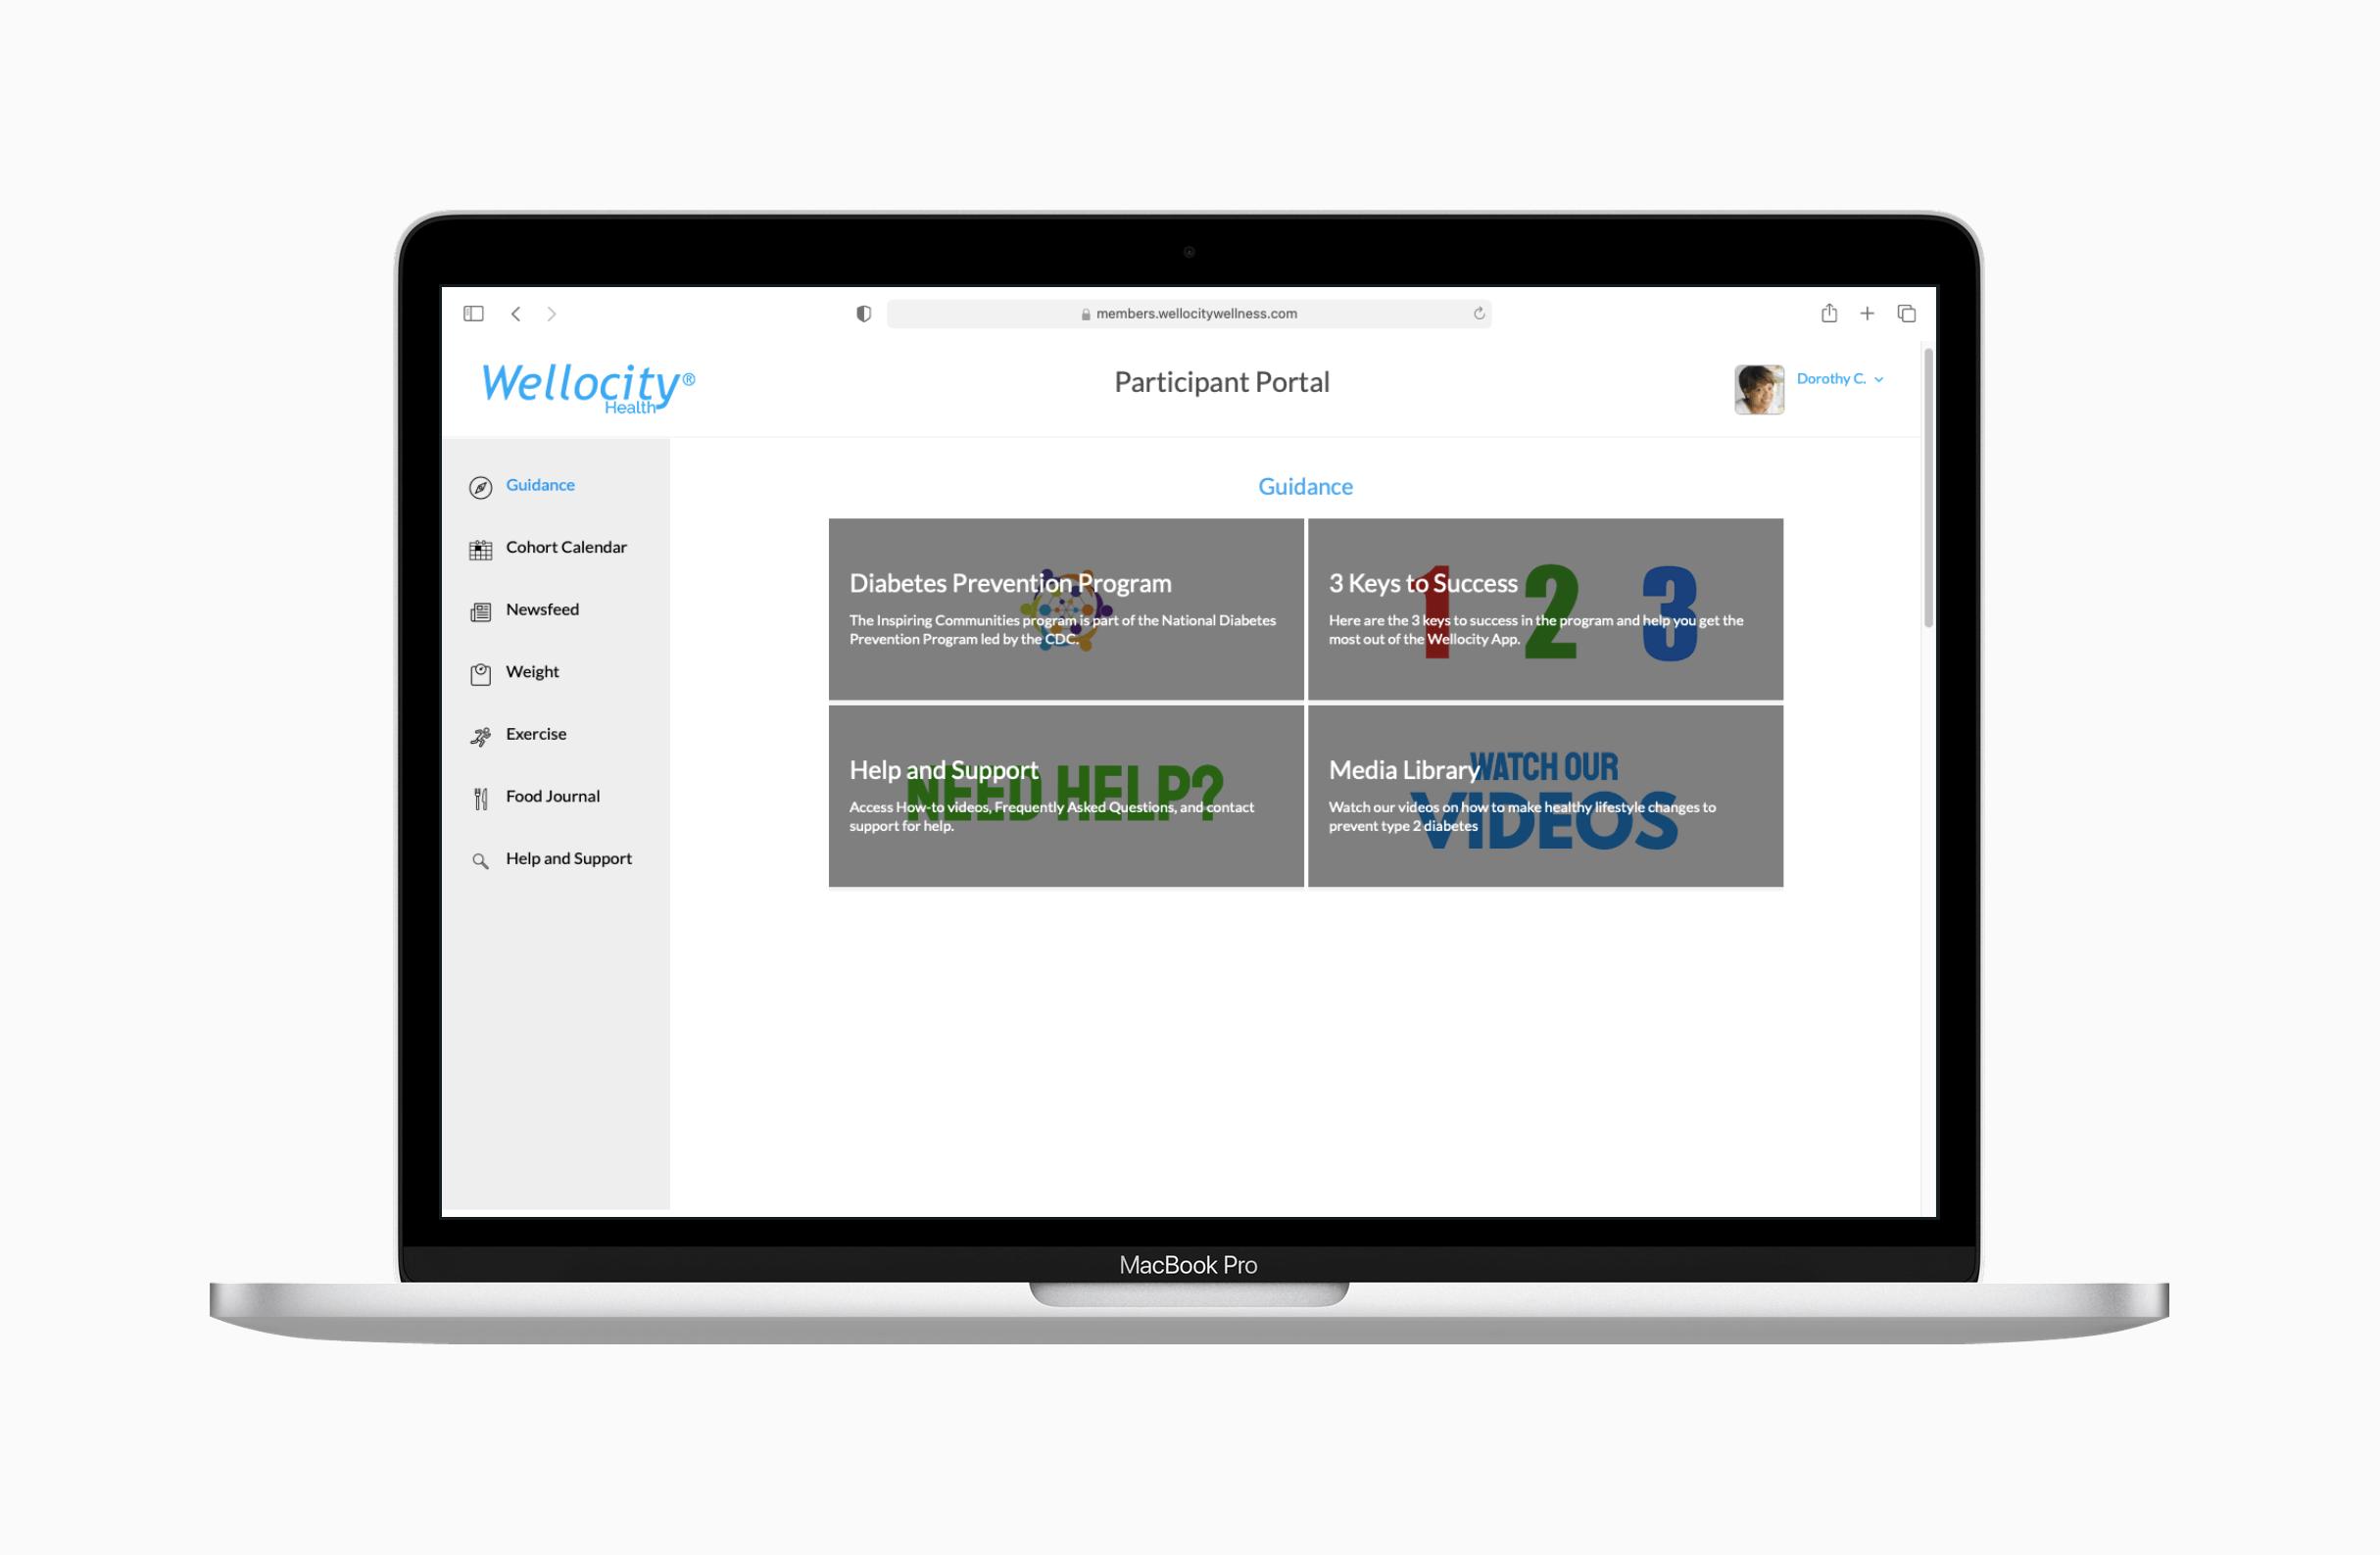 IC portal EN-Macbook Pro 2016 (1)